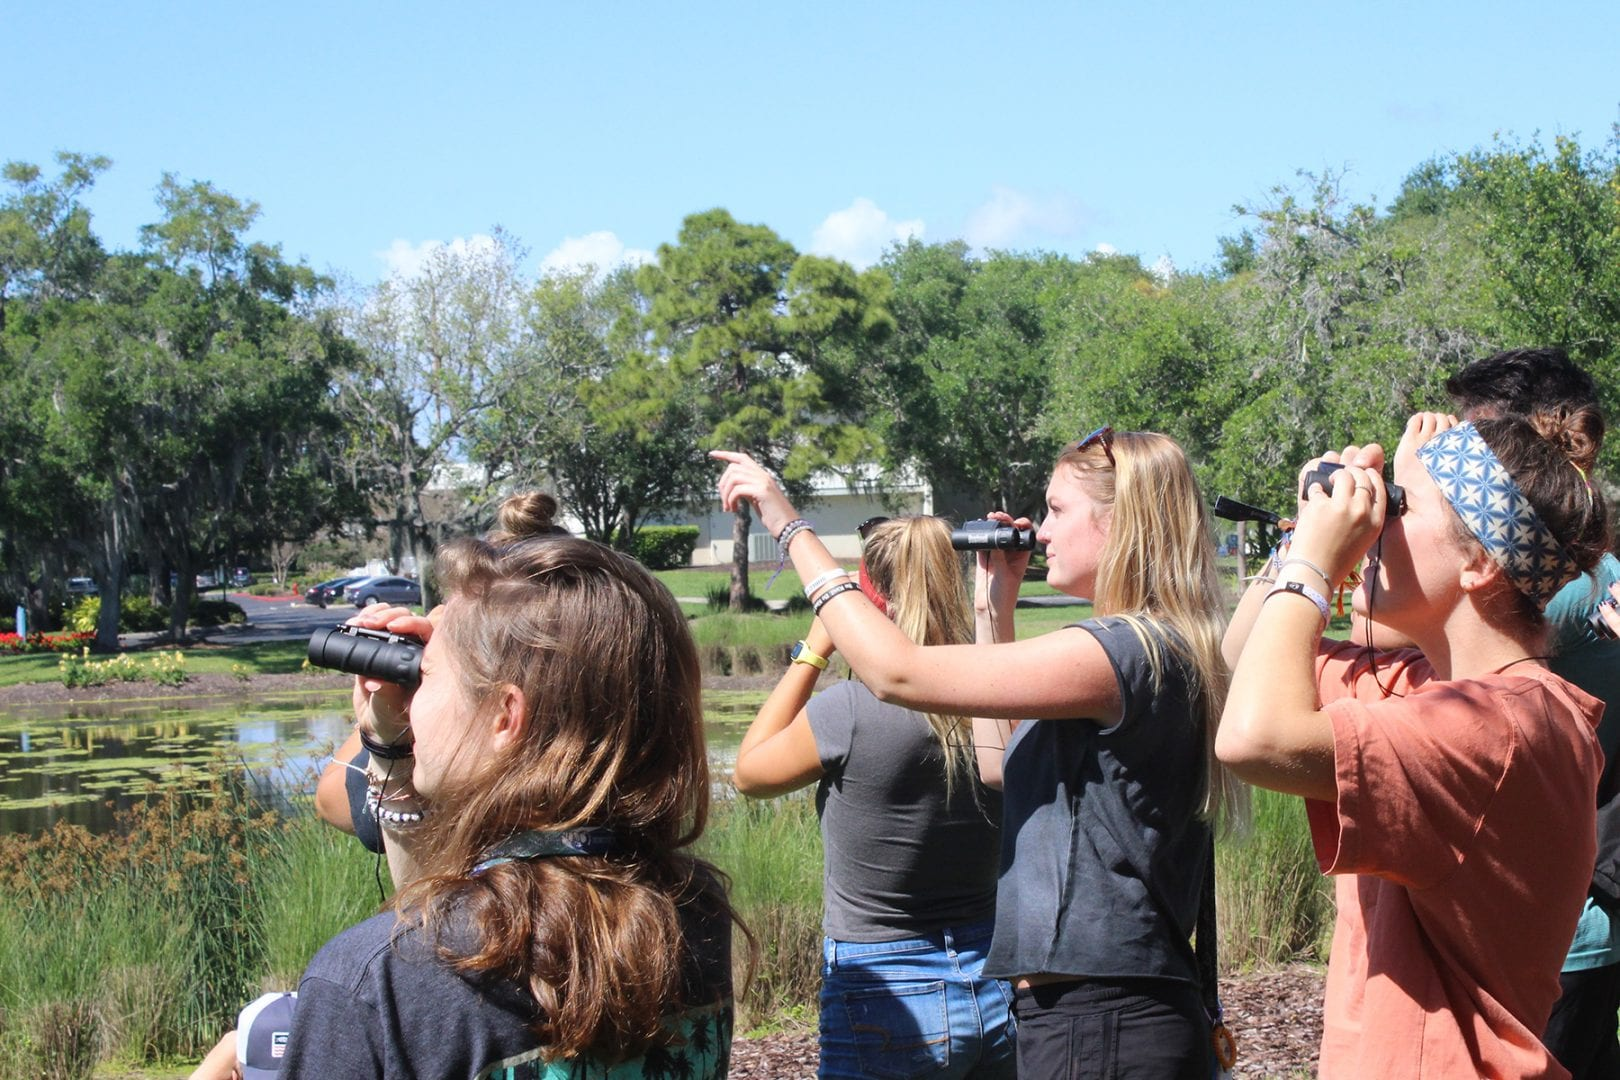 Students with binoculars watch an osprey in an Eckerd College environmental studies class